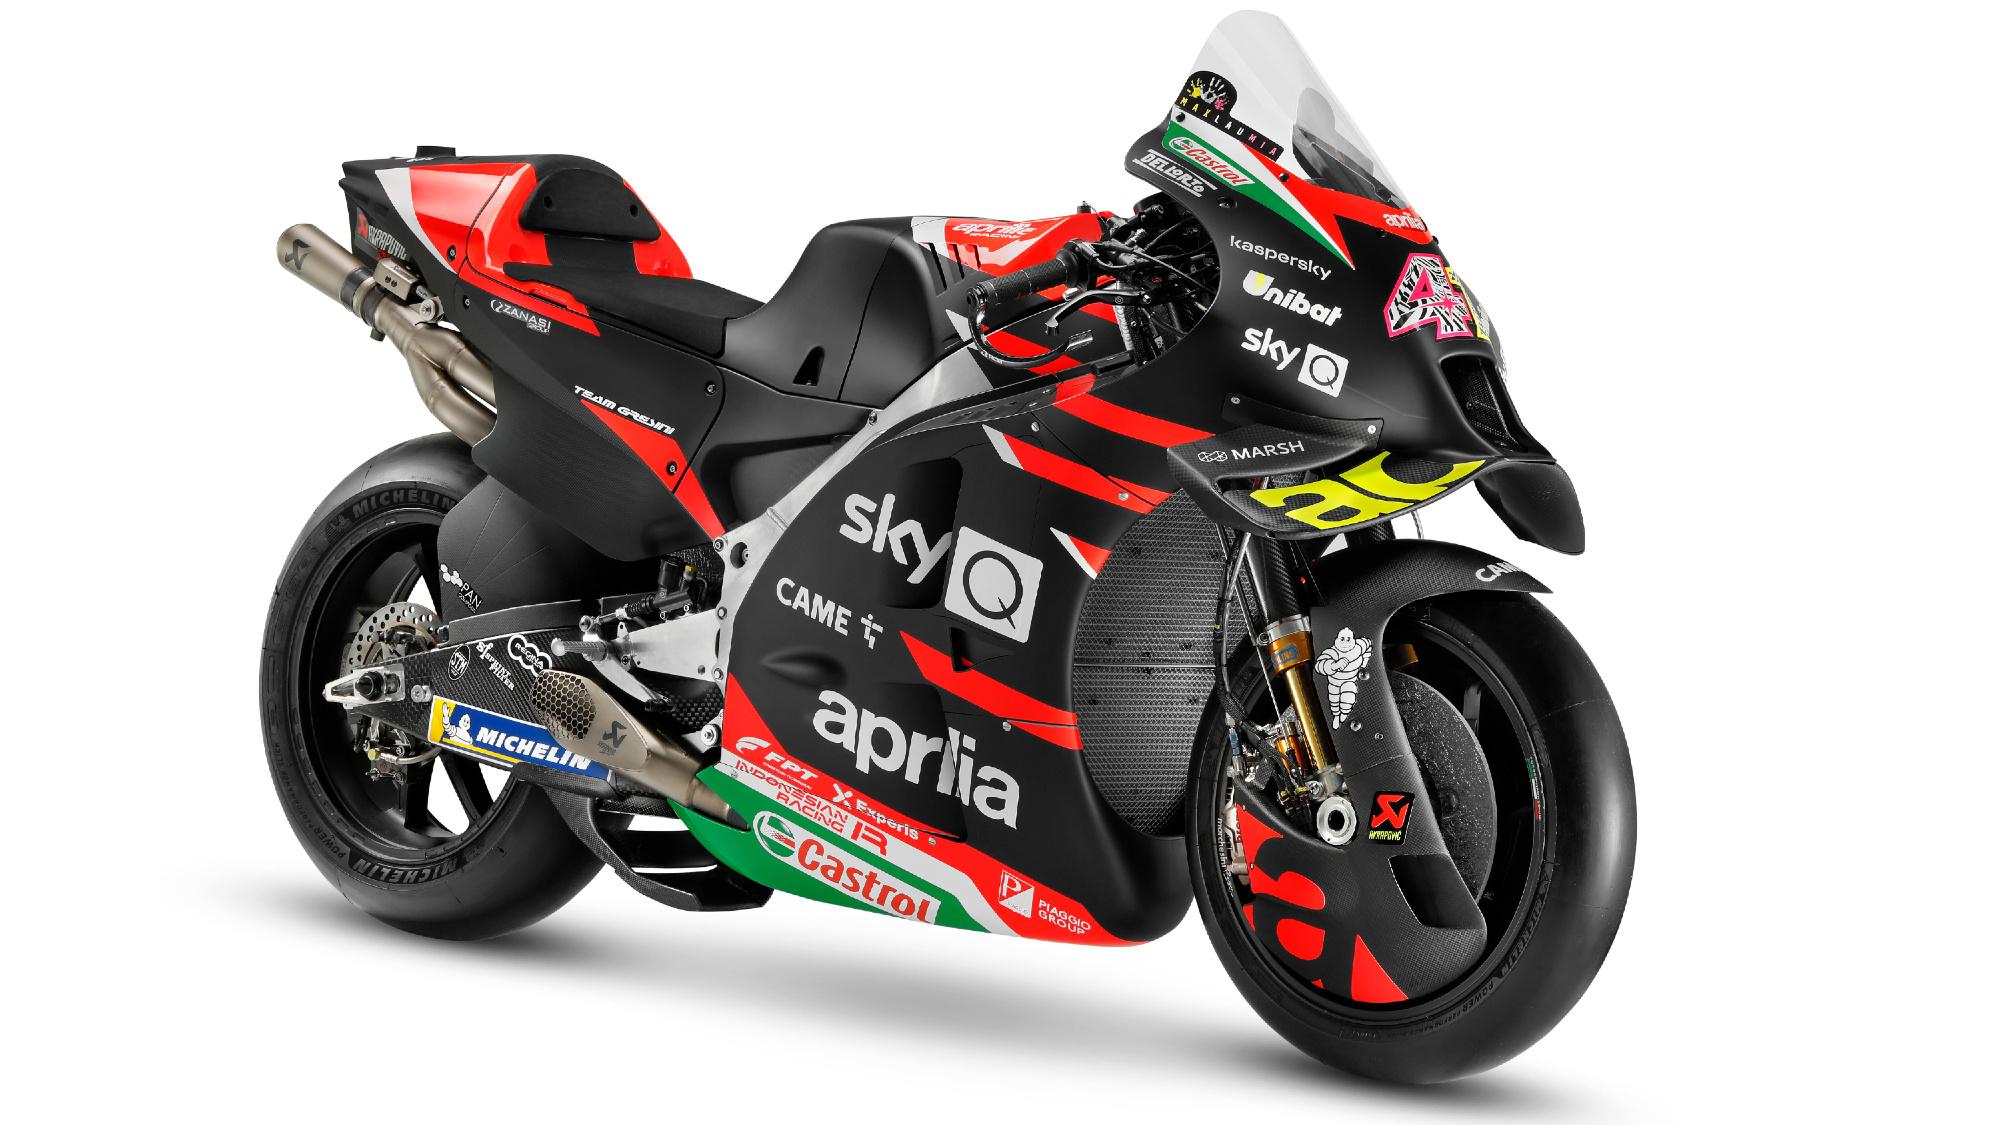 2021 RS-GP Aprilia